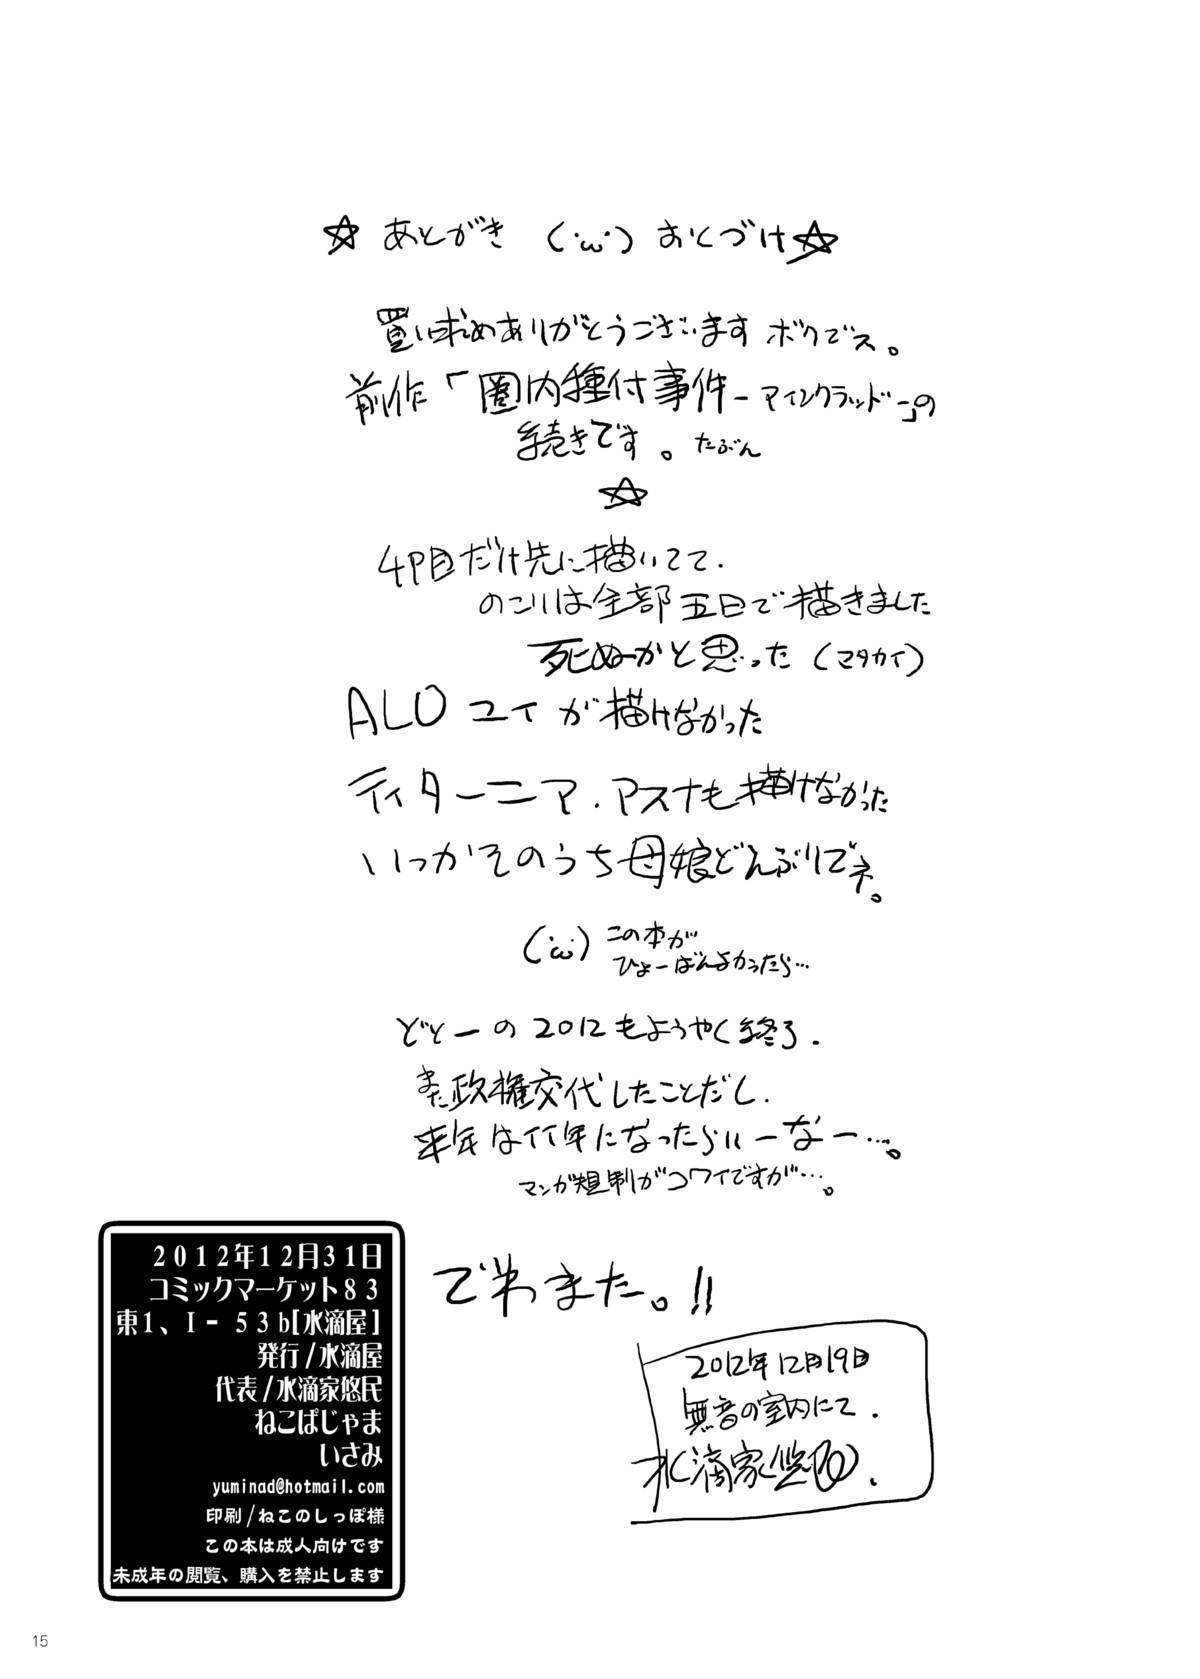 [Suitekiya (Suiteki-ka Yū-min)]Kennai Mating Scandal (1: Einclad / 2: Fairy Dance) SAO The Complete (Sword Art Online) 29